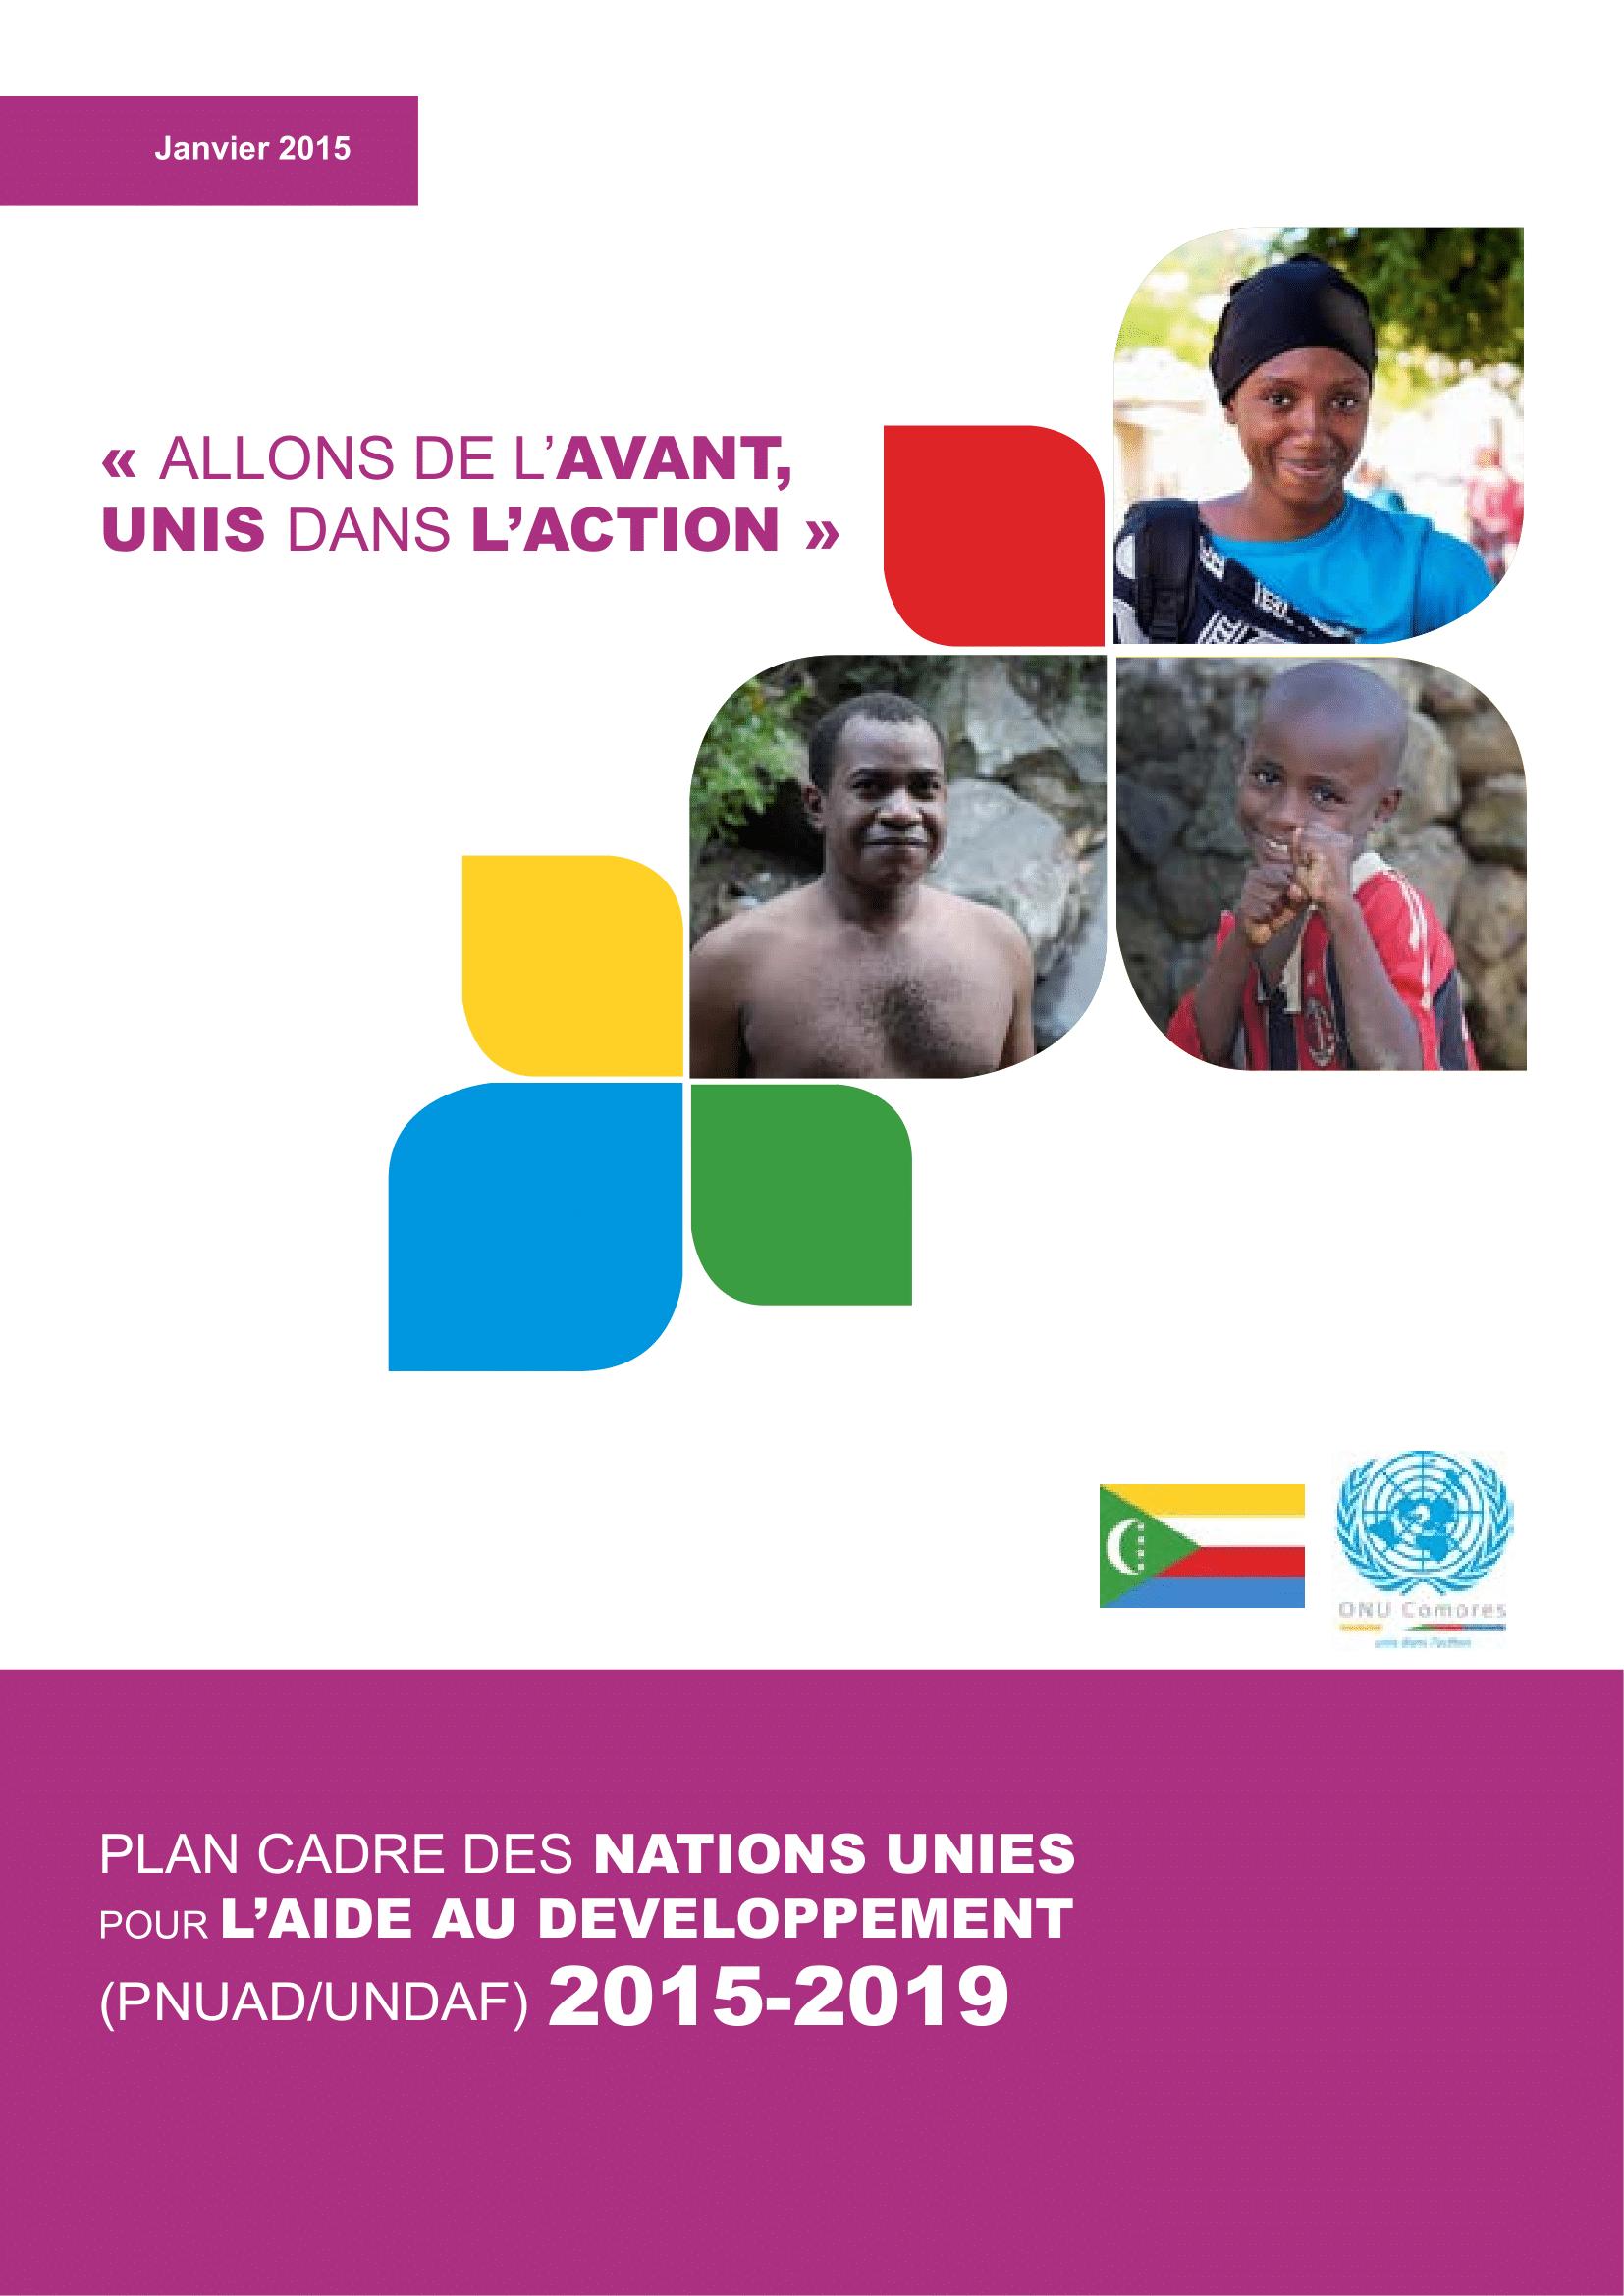 UNDAF Comores